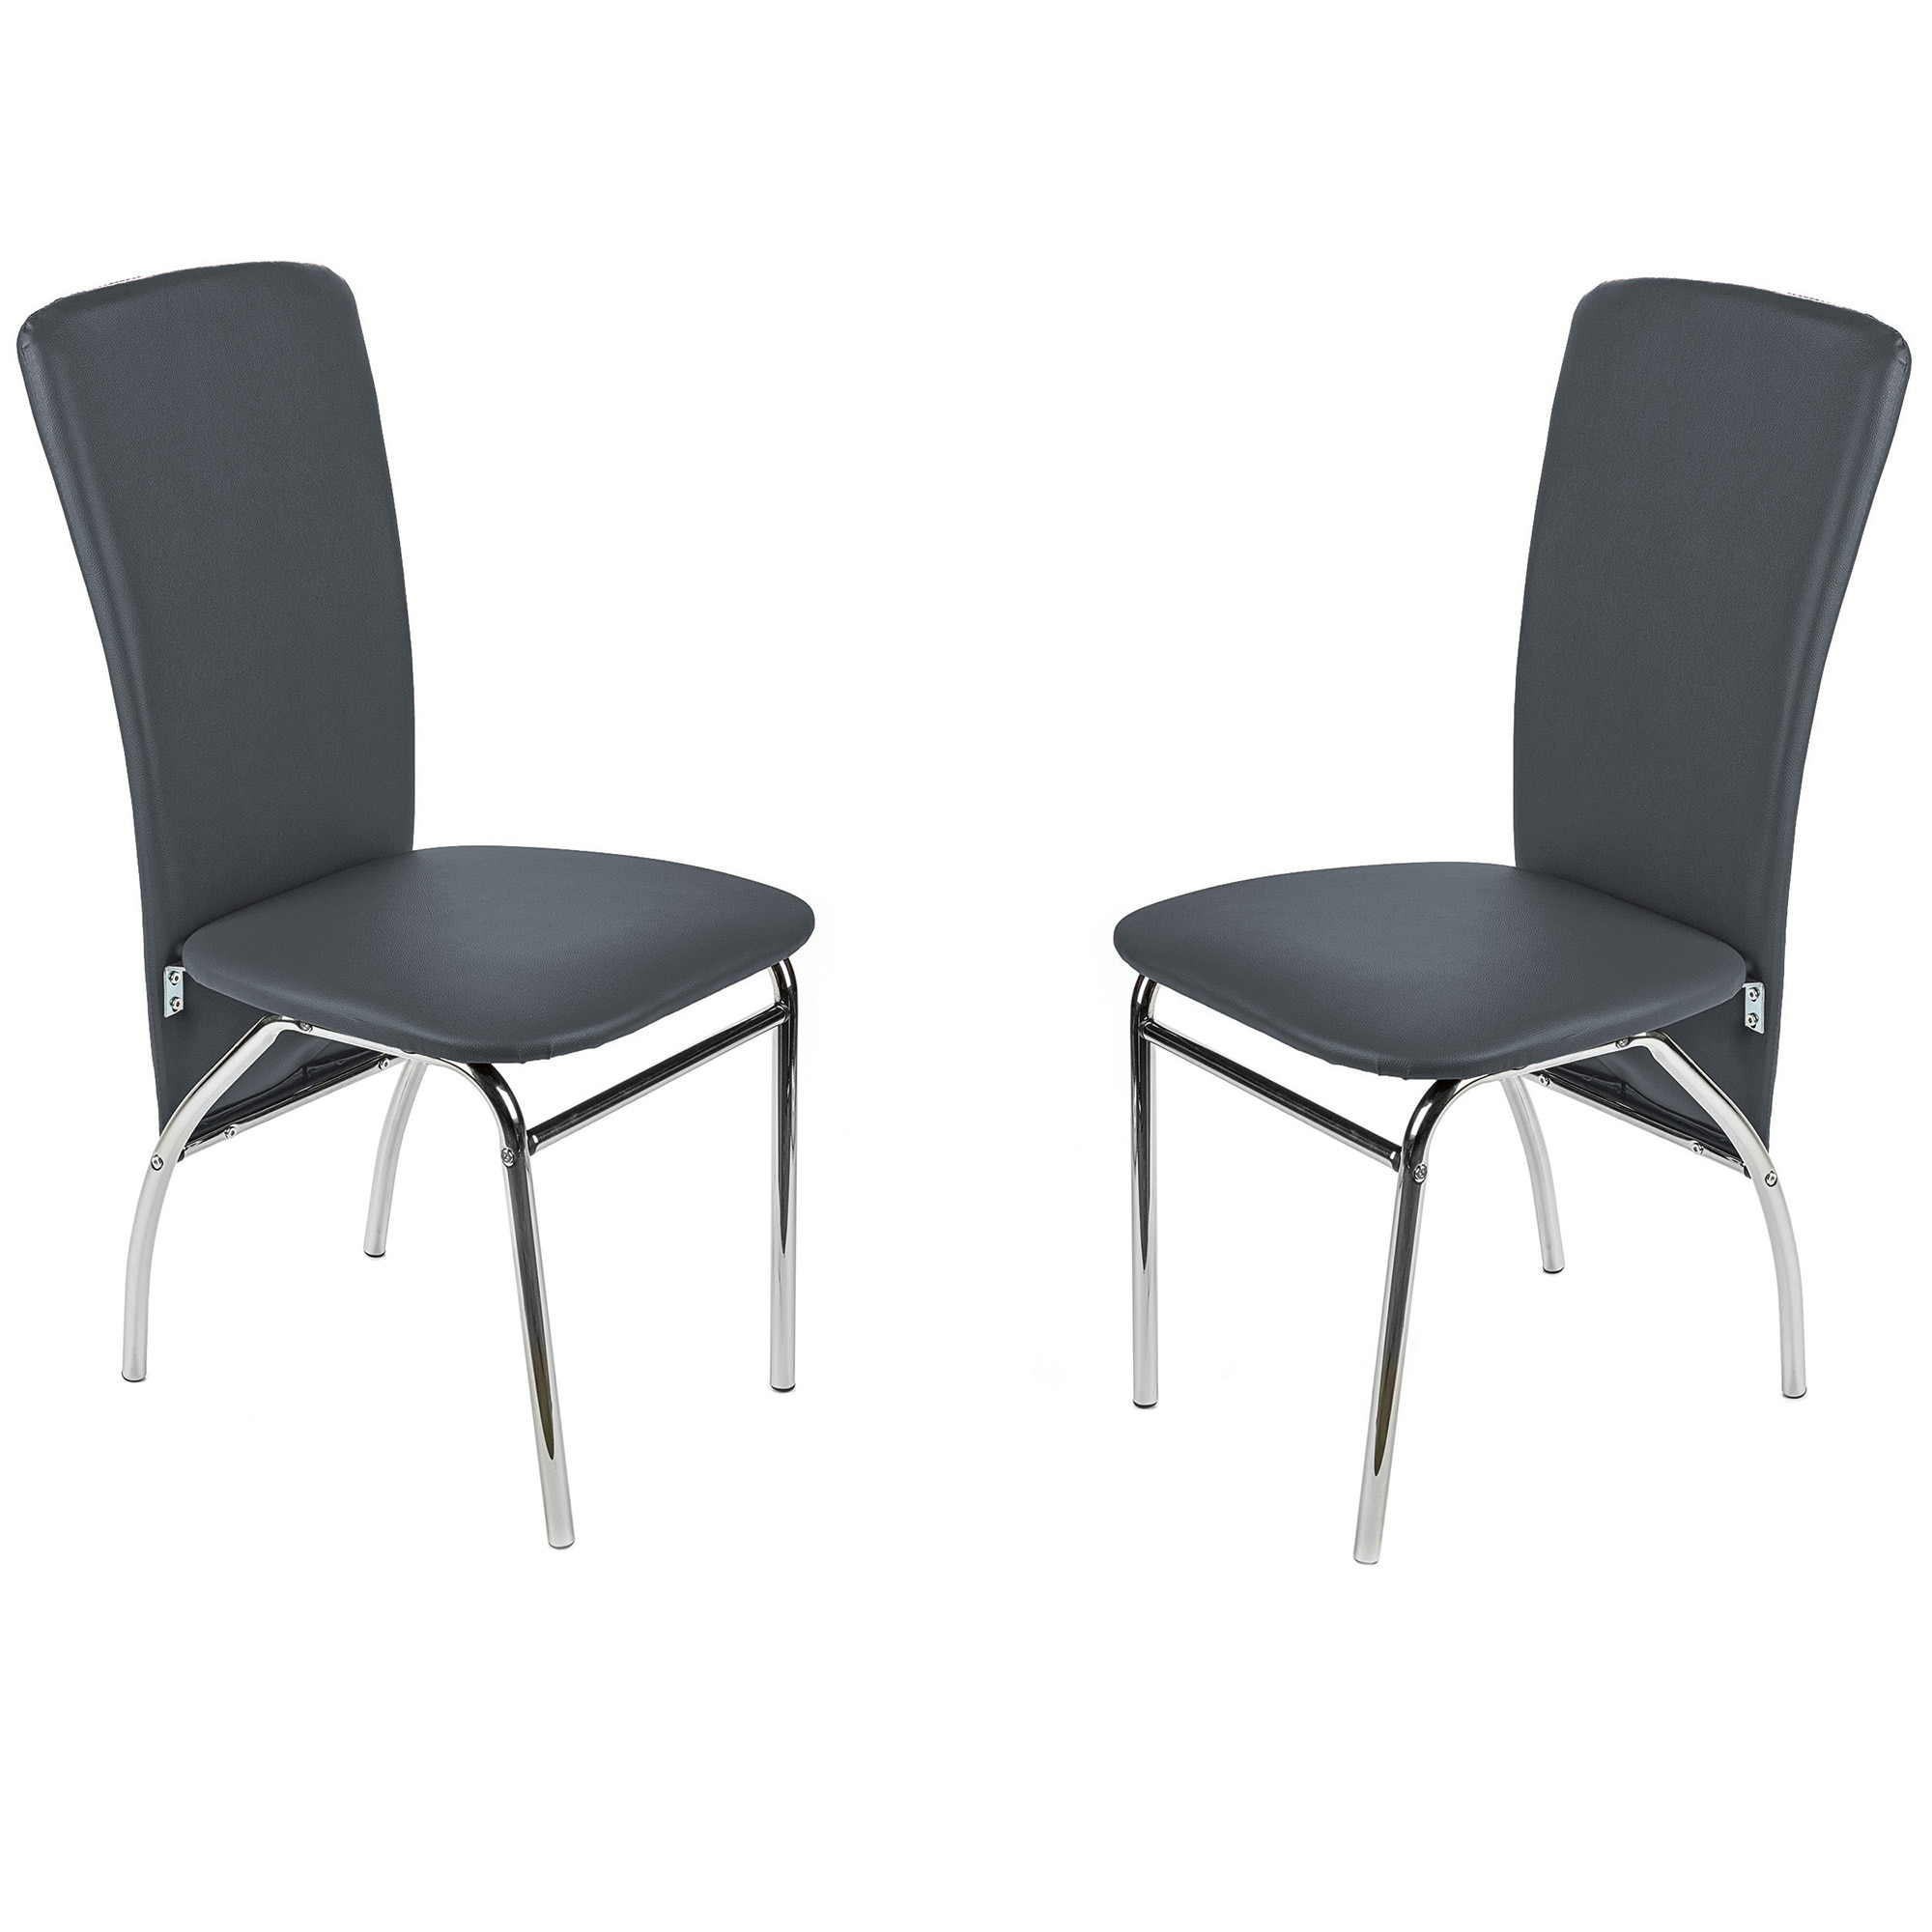 Fotografie Set 2 scaune dining / bucatarie Kring Milano, Gri